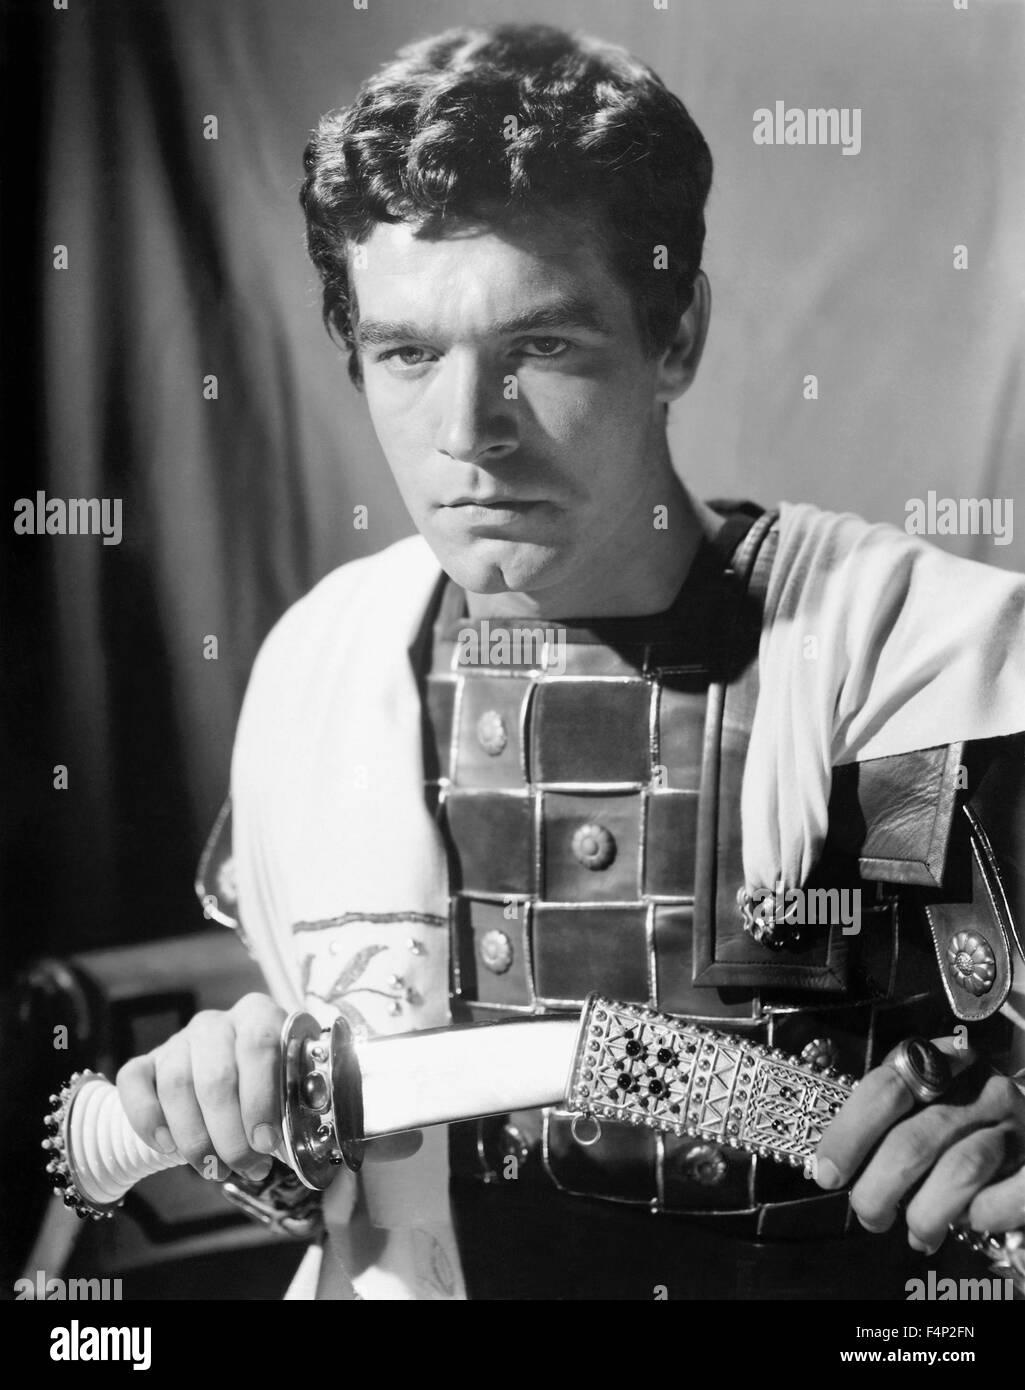 Stephen Boyd / Ben-Hur 1959 directed by William Wyler - Stock Image